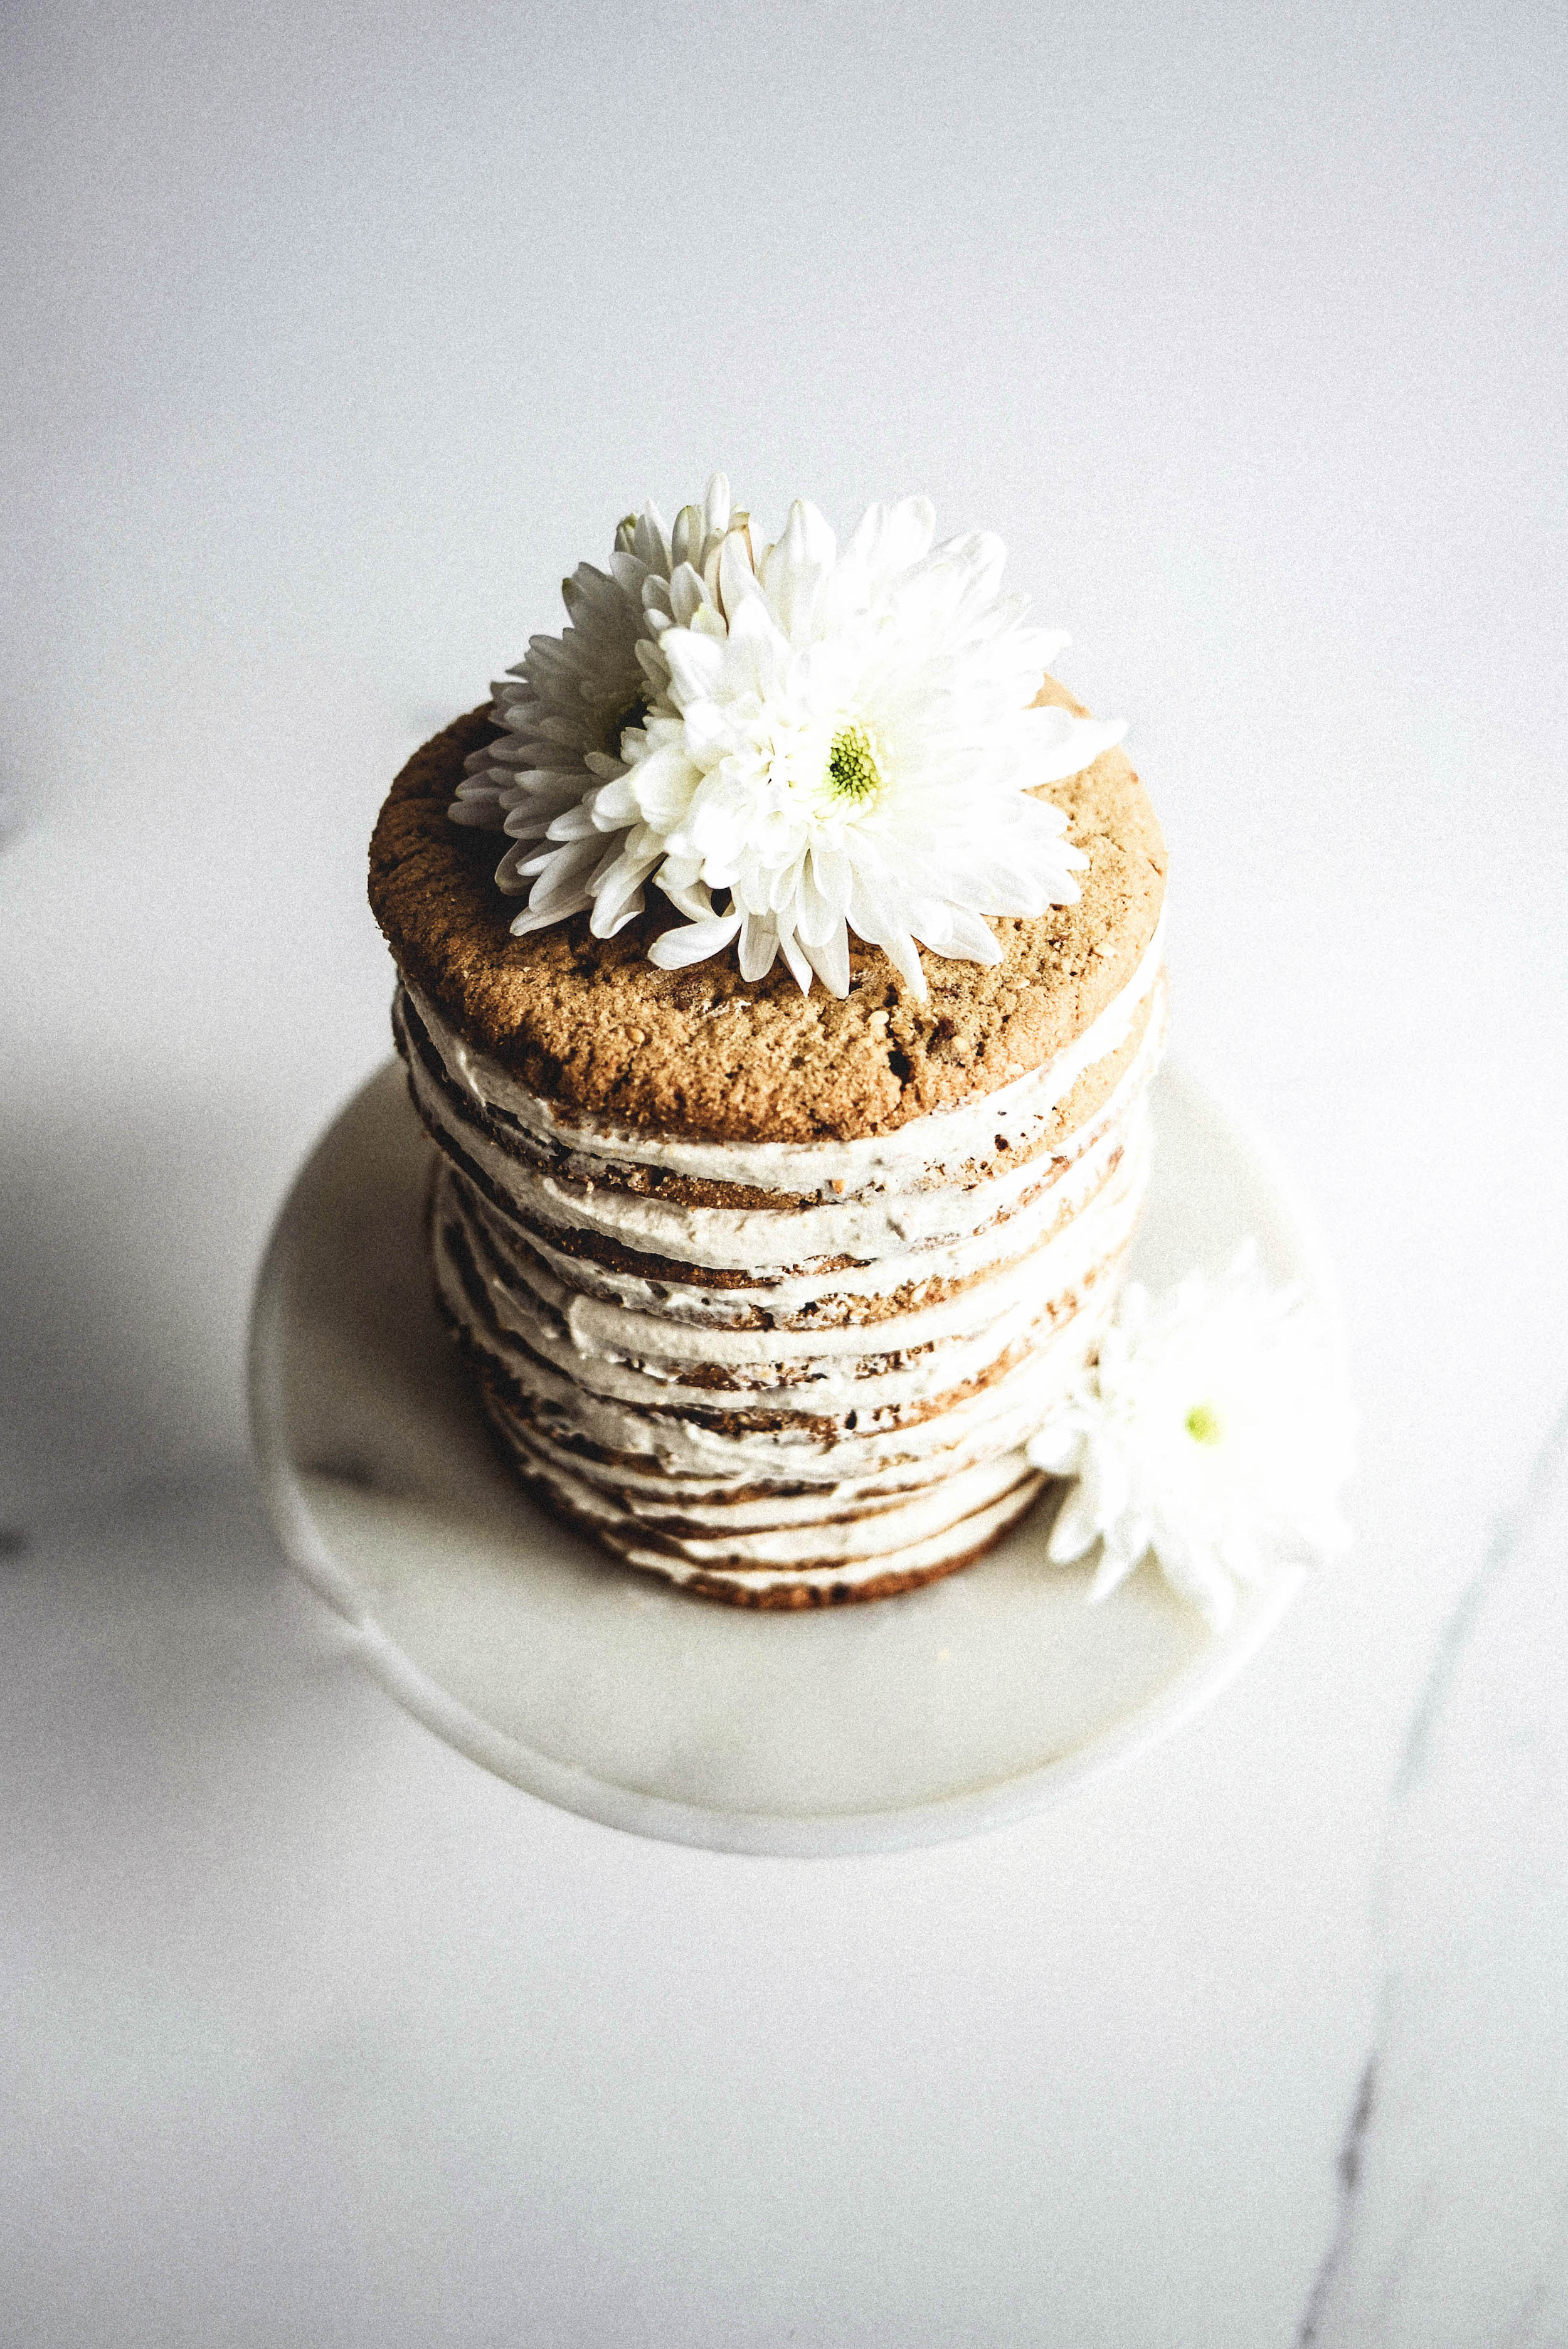 Toasted-Sesame-and-Chocolate-Cookie-Cake-with-Tahini-Halva-Buttercream-5.jpg